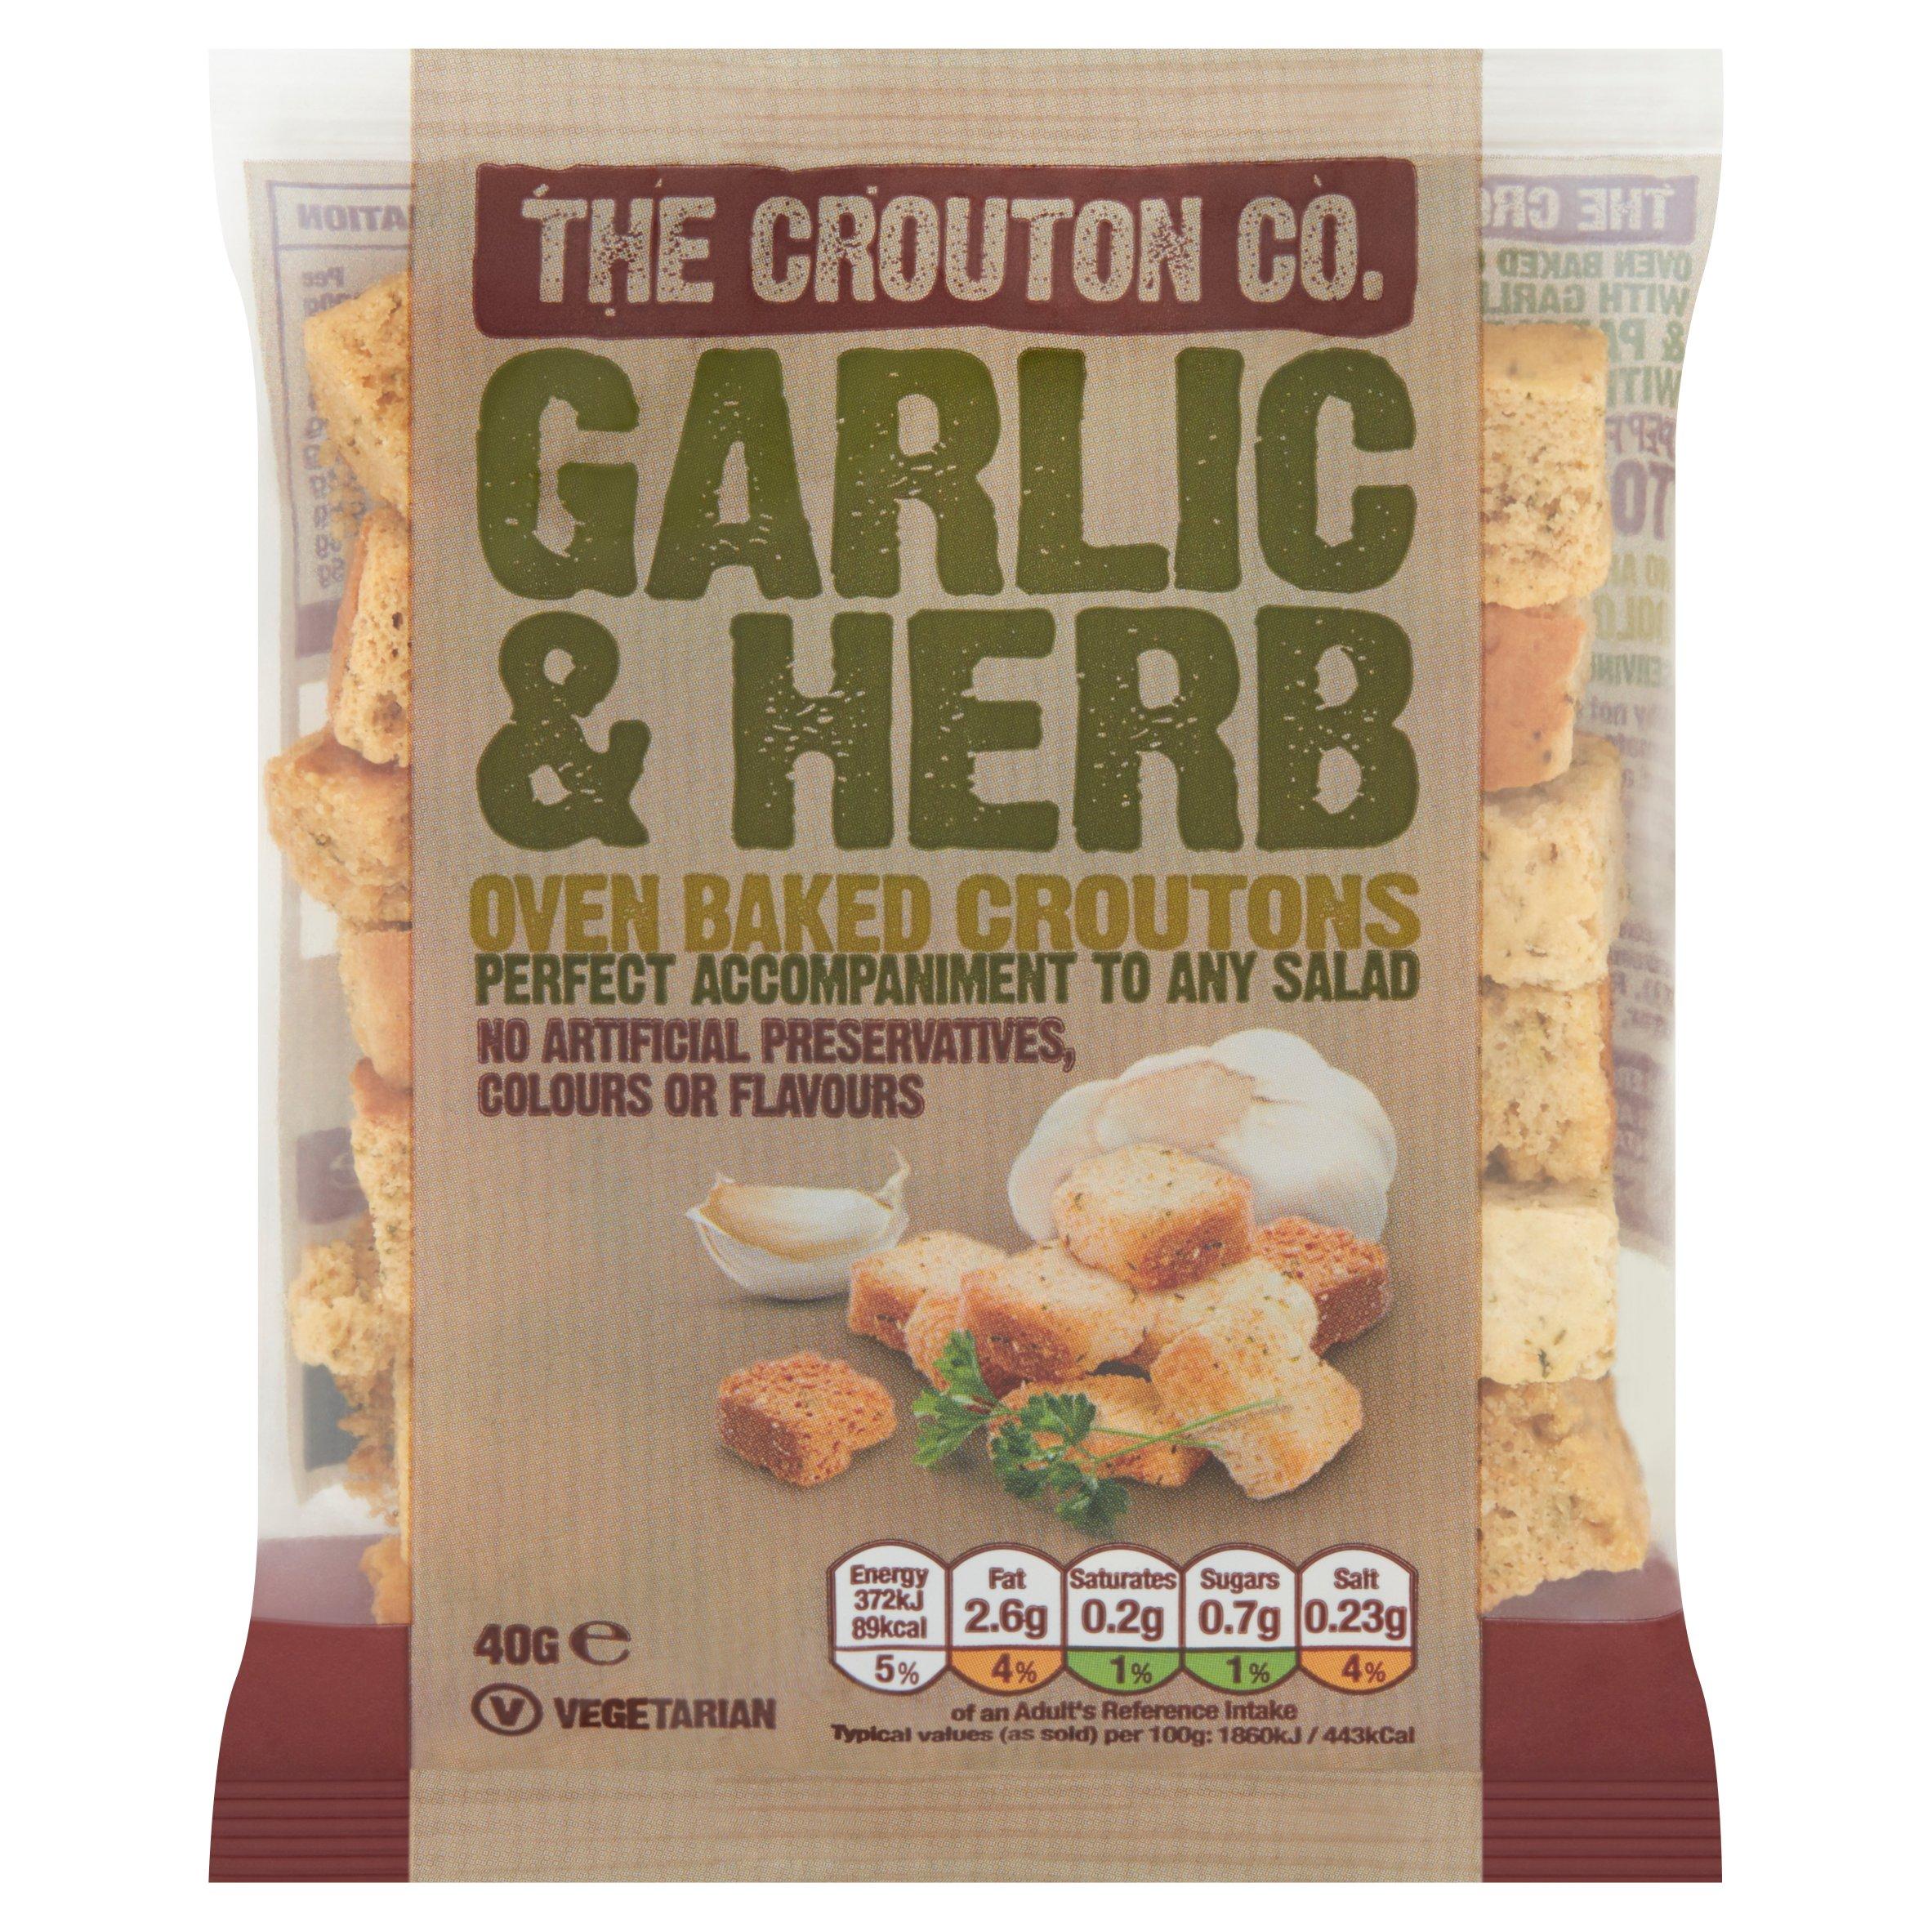 Crouton Company Garlic & Herb Croutons 40G